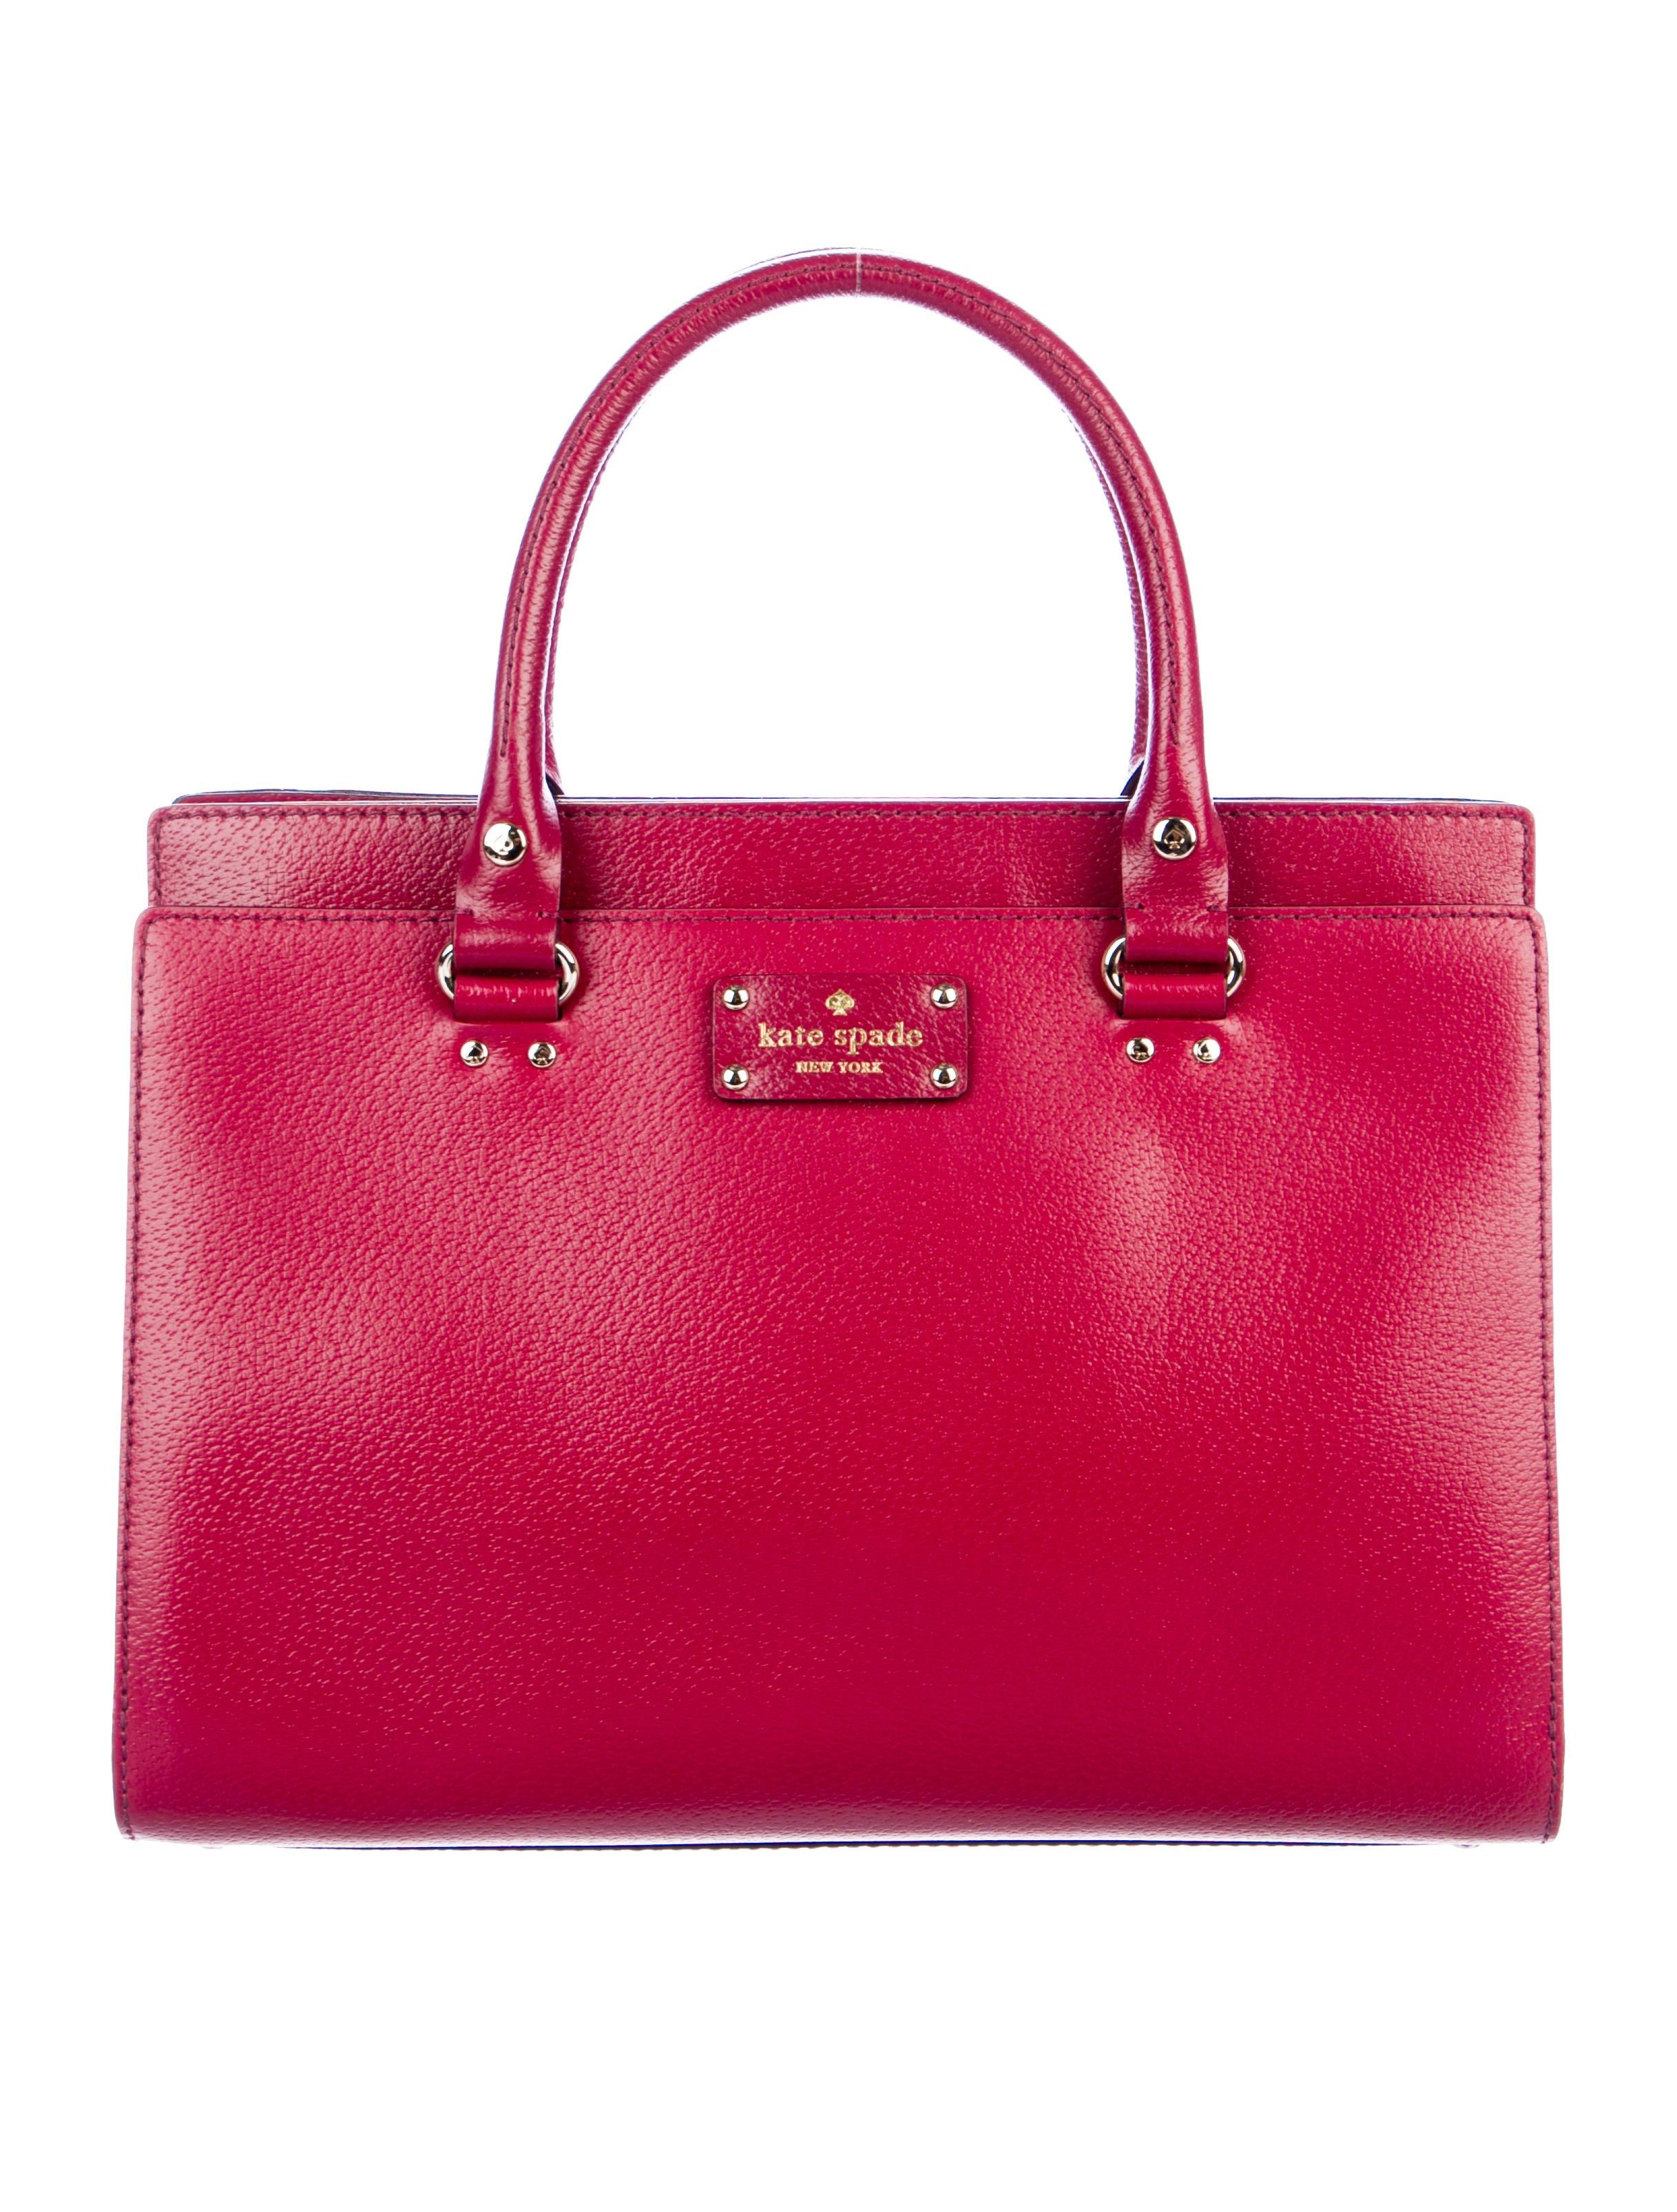 e956a51c348bc2 Kate Spade New York Wellesley Durham Bag - Handbags - WKA91984 | The  RealReal